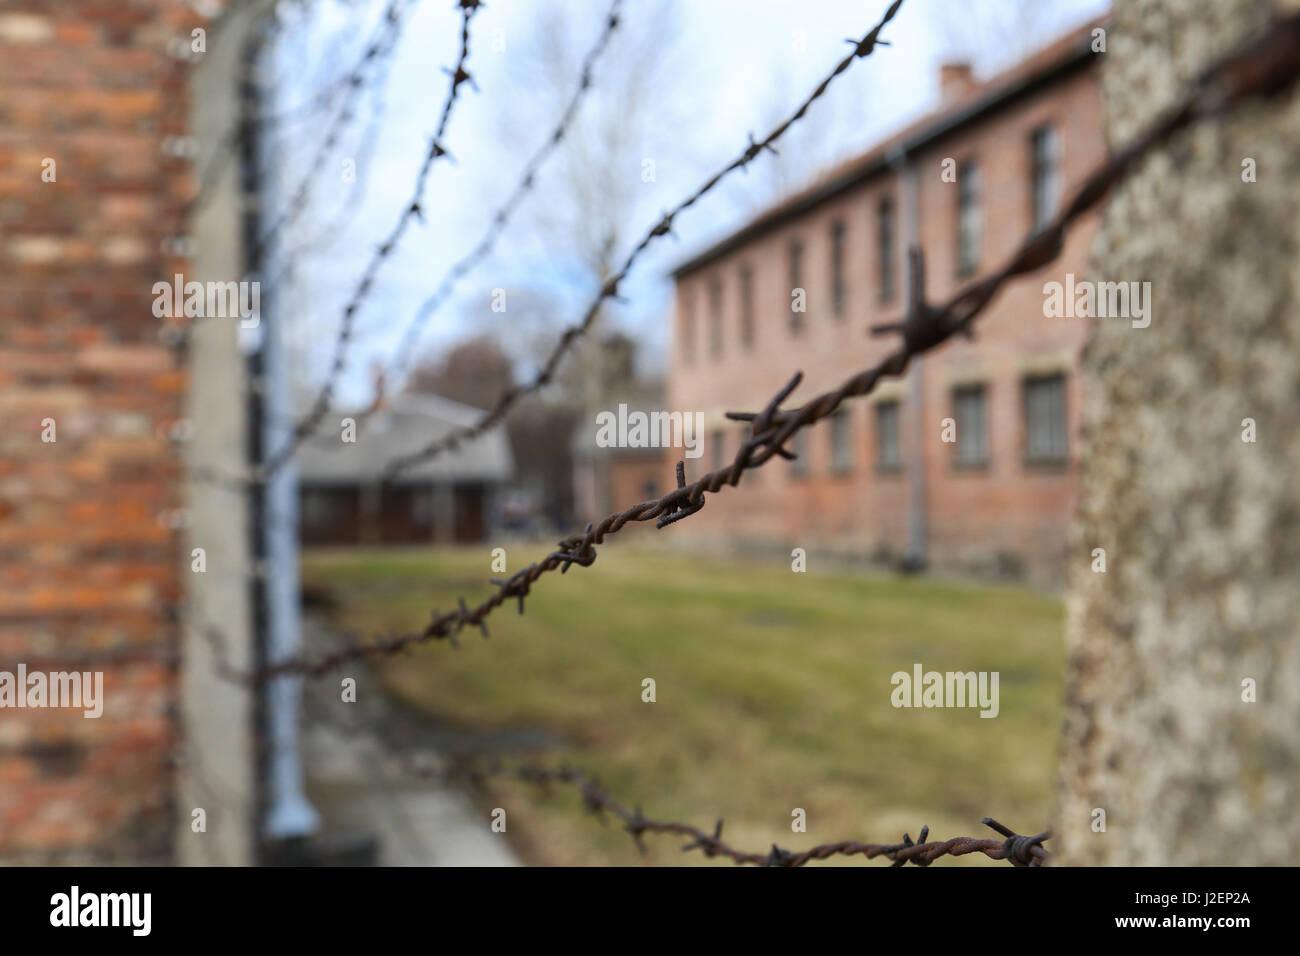 Death Row Prison Stockfotos & Death Row Prison Bilder - Alamy